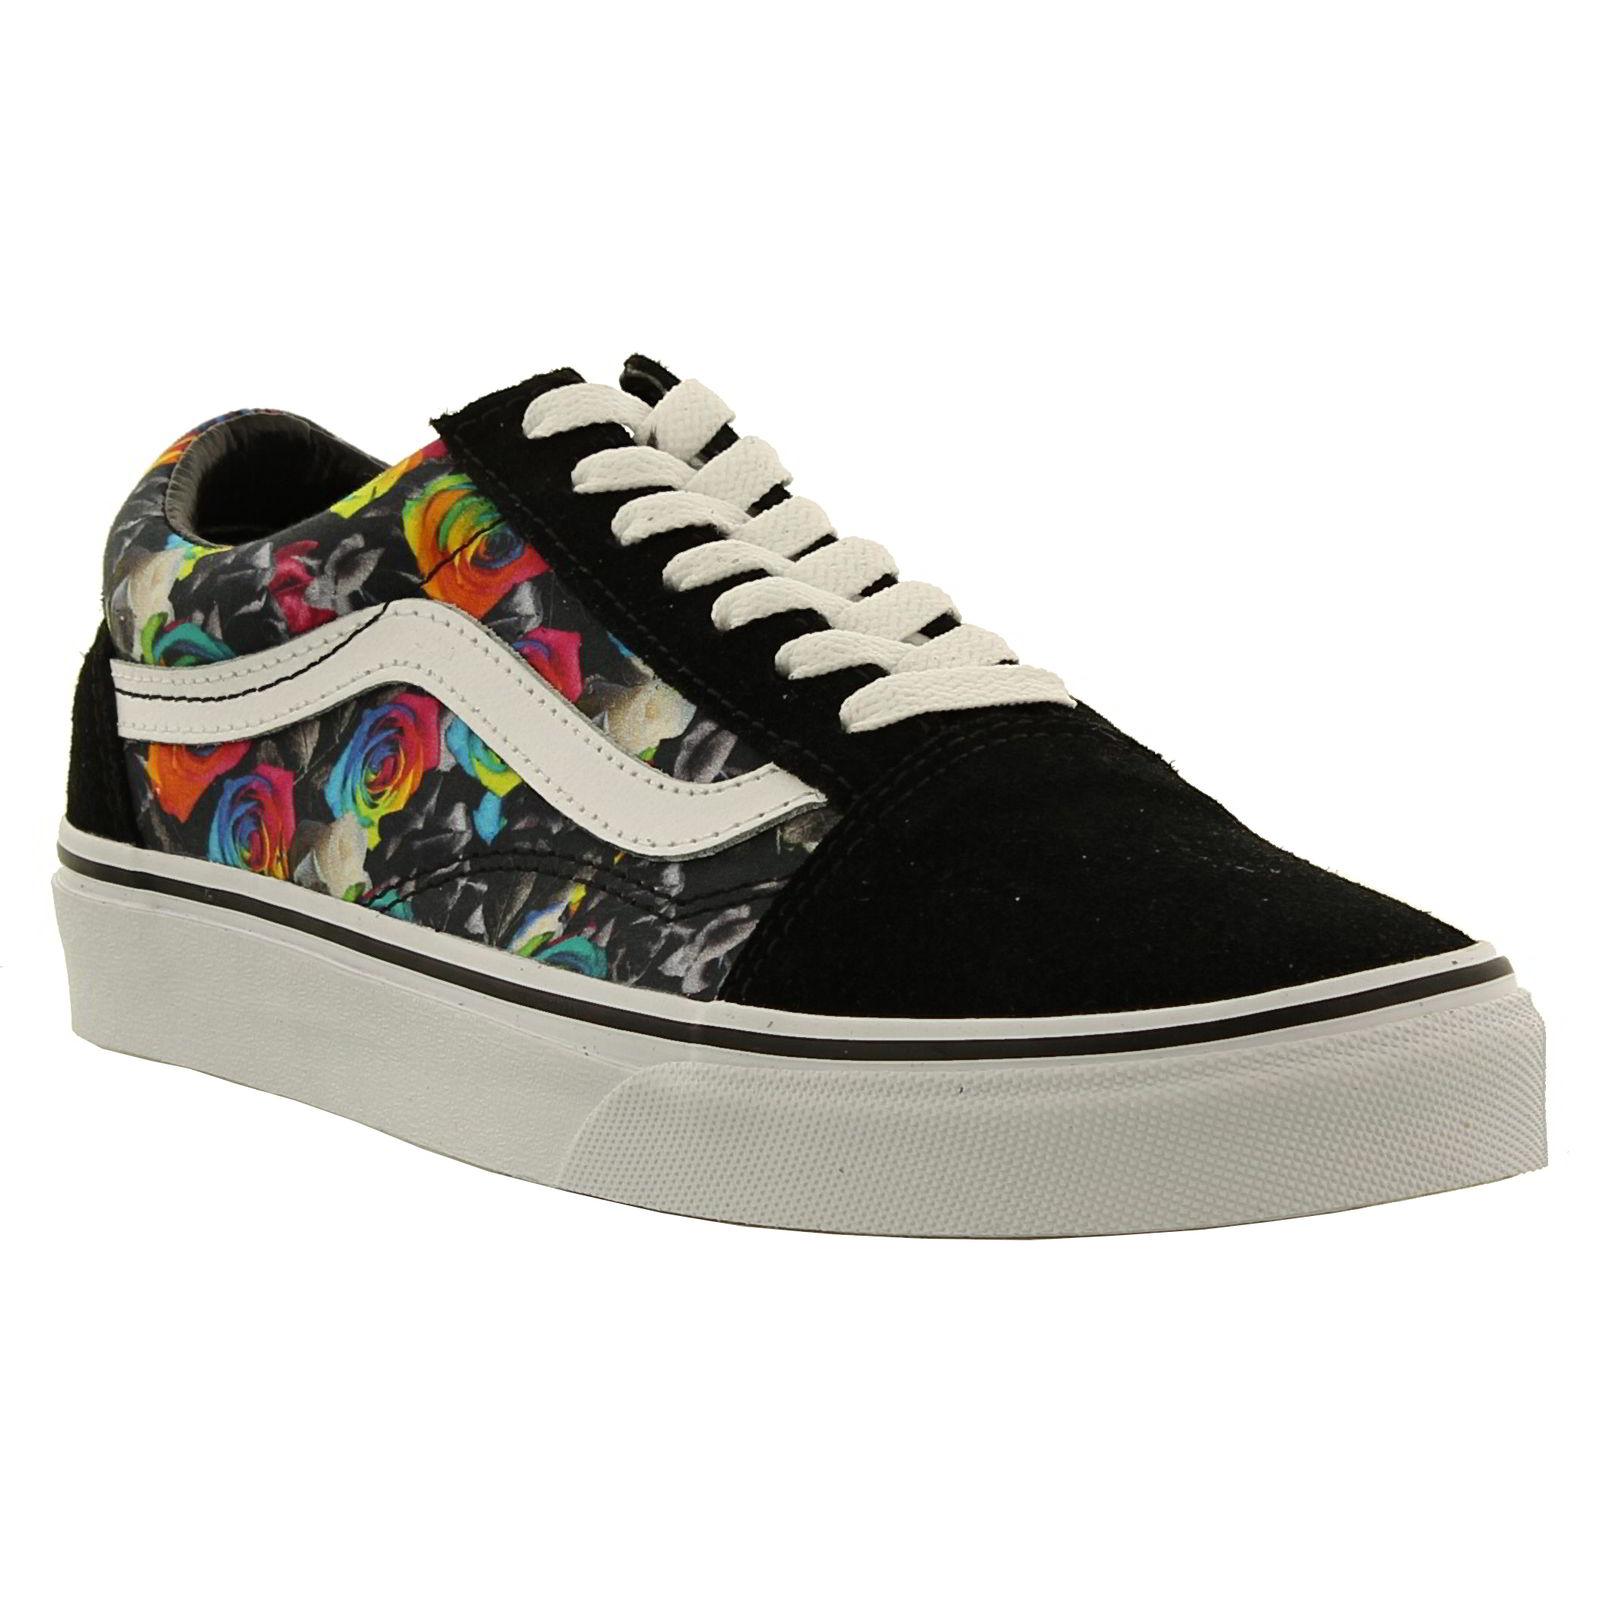 vans old skool womens classic black skate shoes trainers. Black Bedroom Furniture Sets. Home Design Ideas